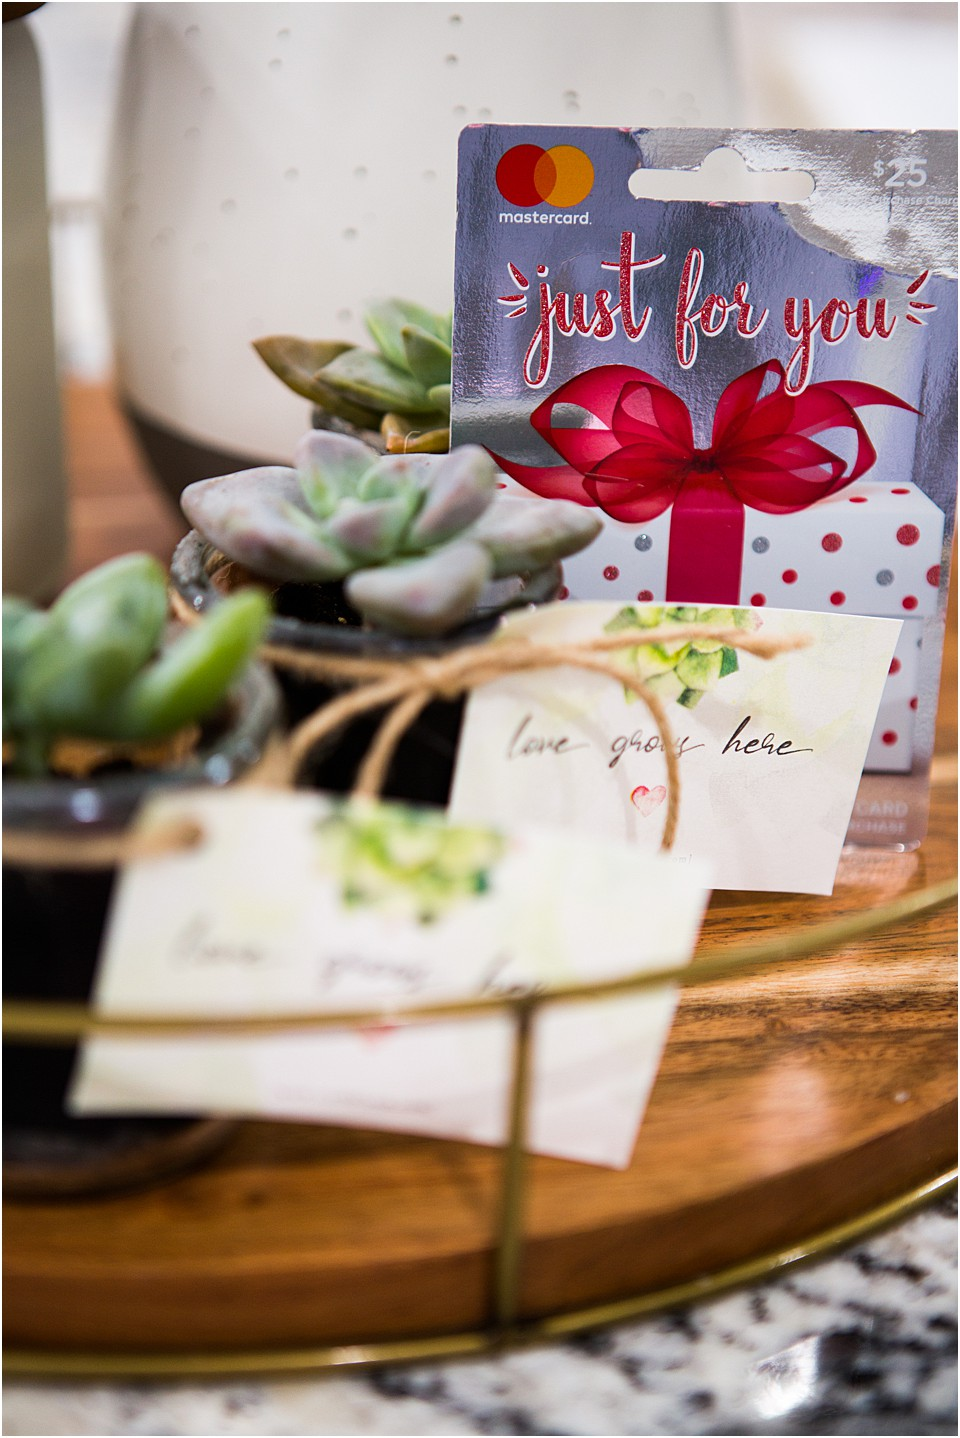 Love Grows Here - Free Printable